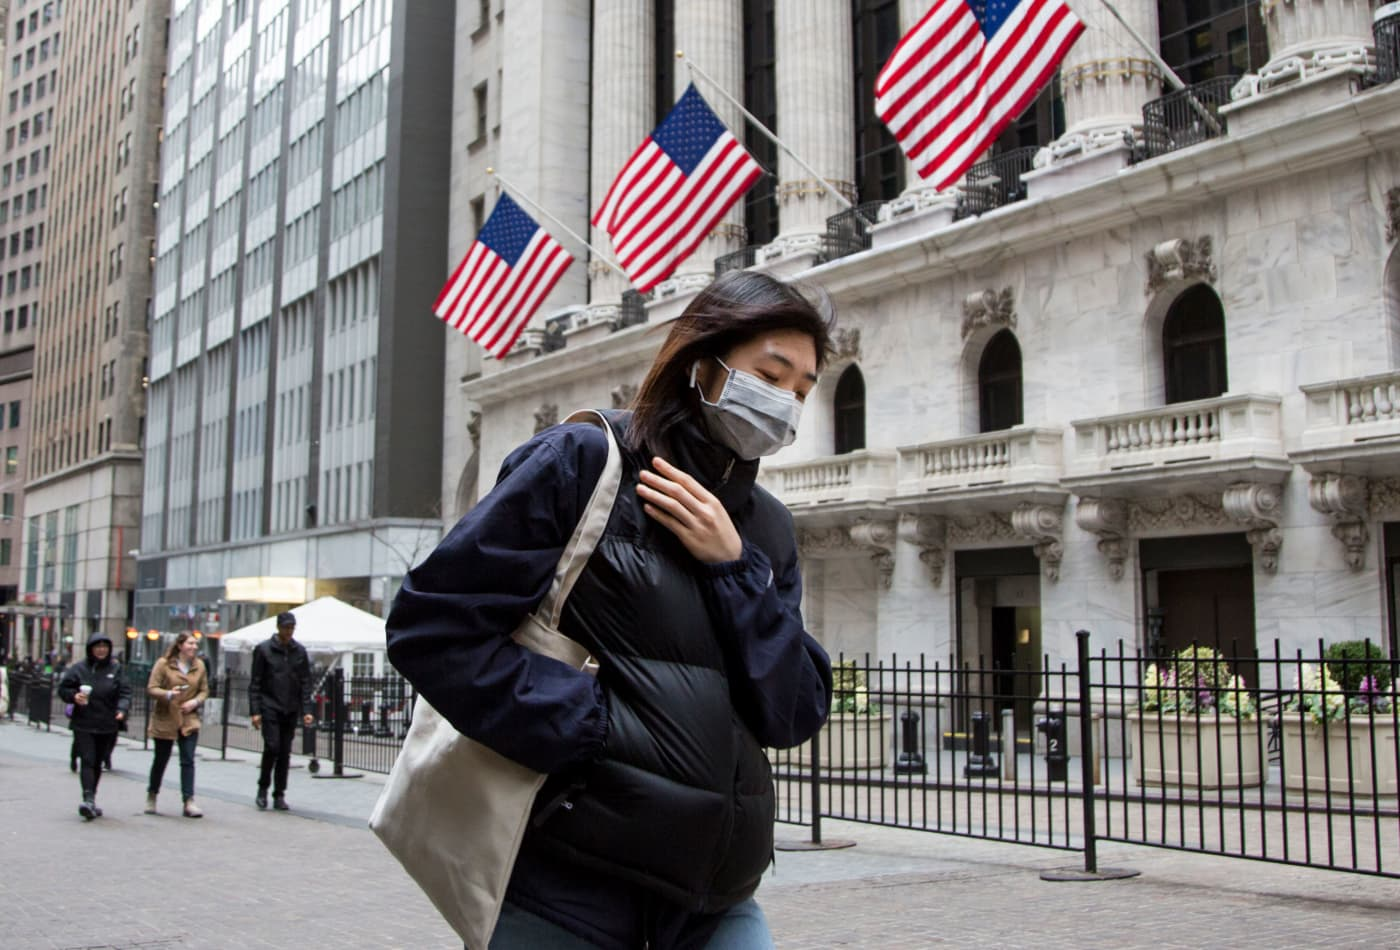 5 ways to ensure the coronavirus outbreak doesn't cripple your retirement savings